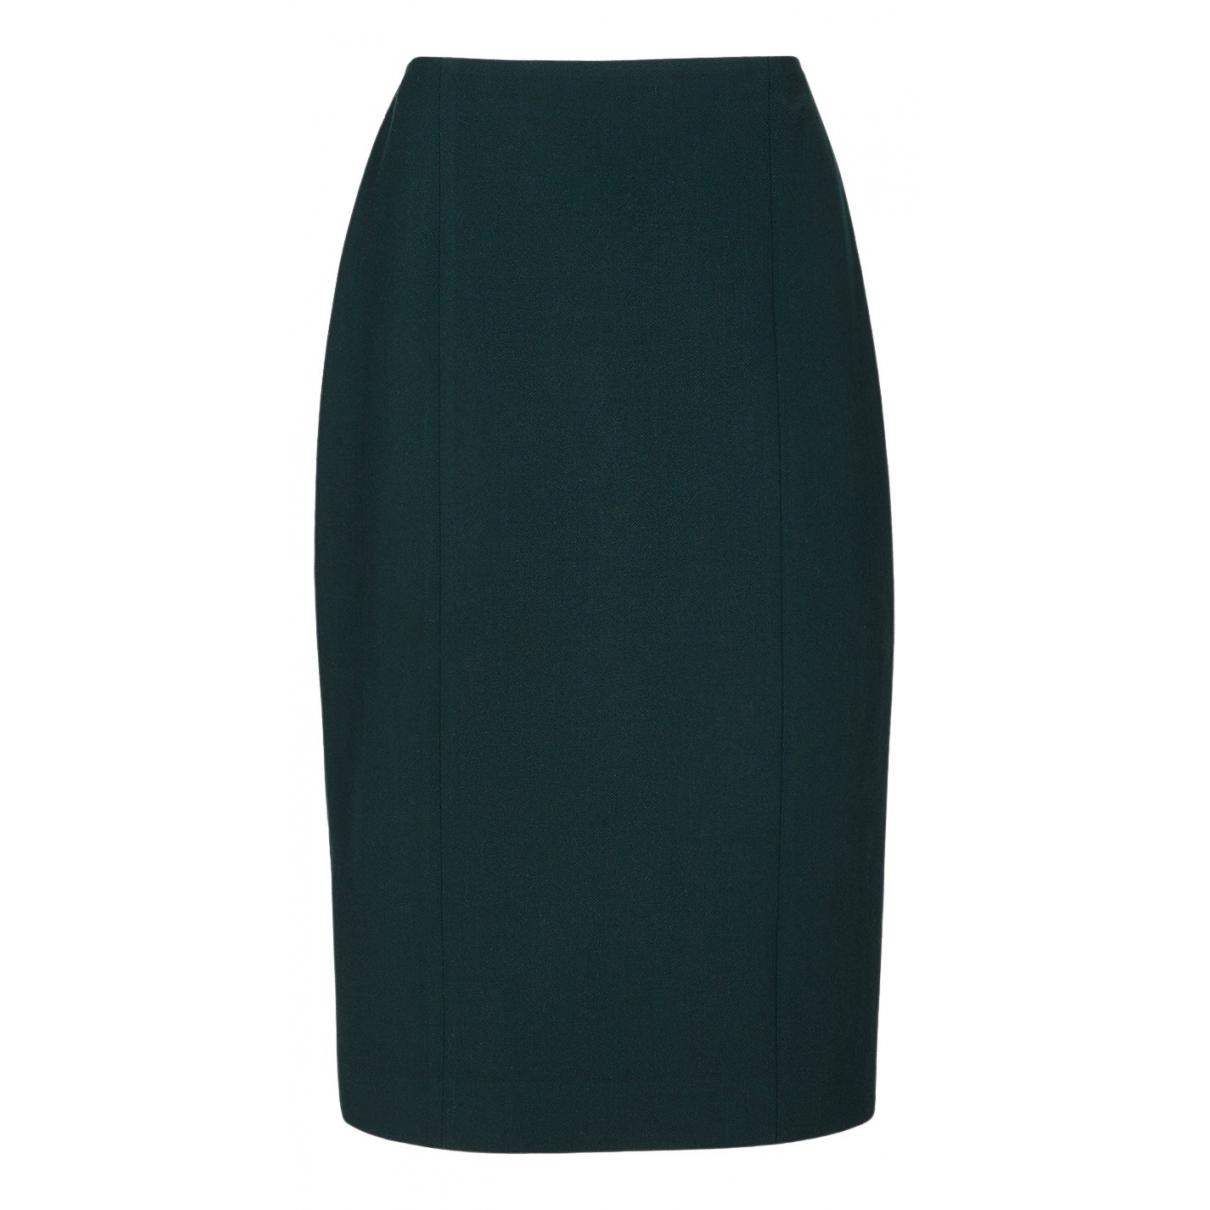 Amanda Wakeley N Green skirt for Women 12 UK